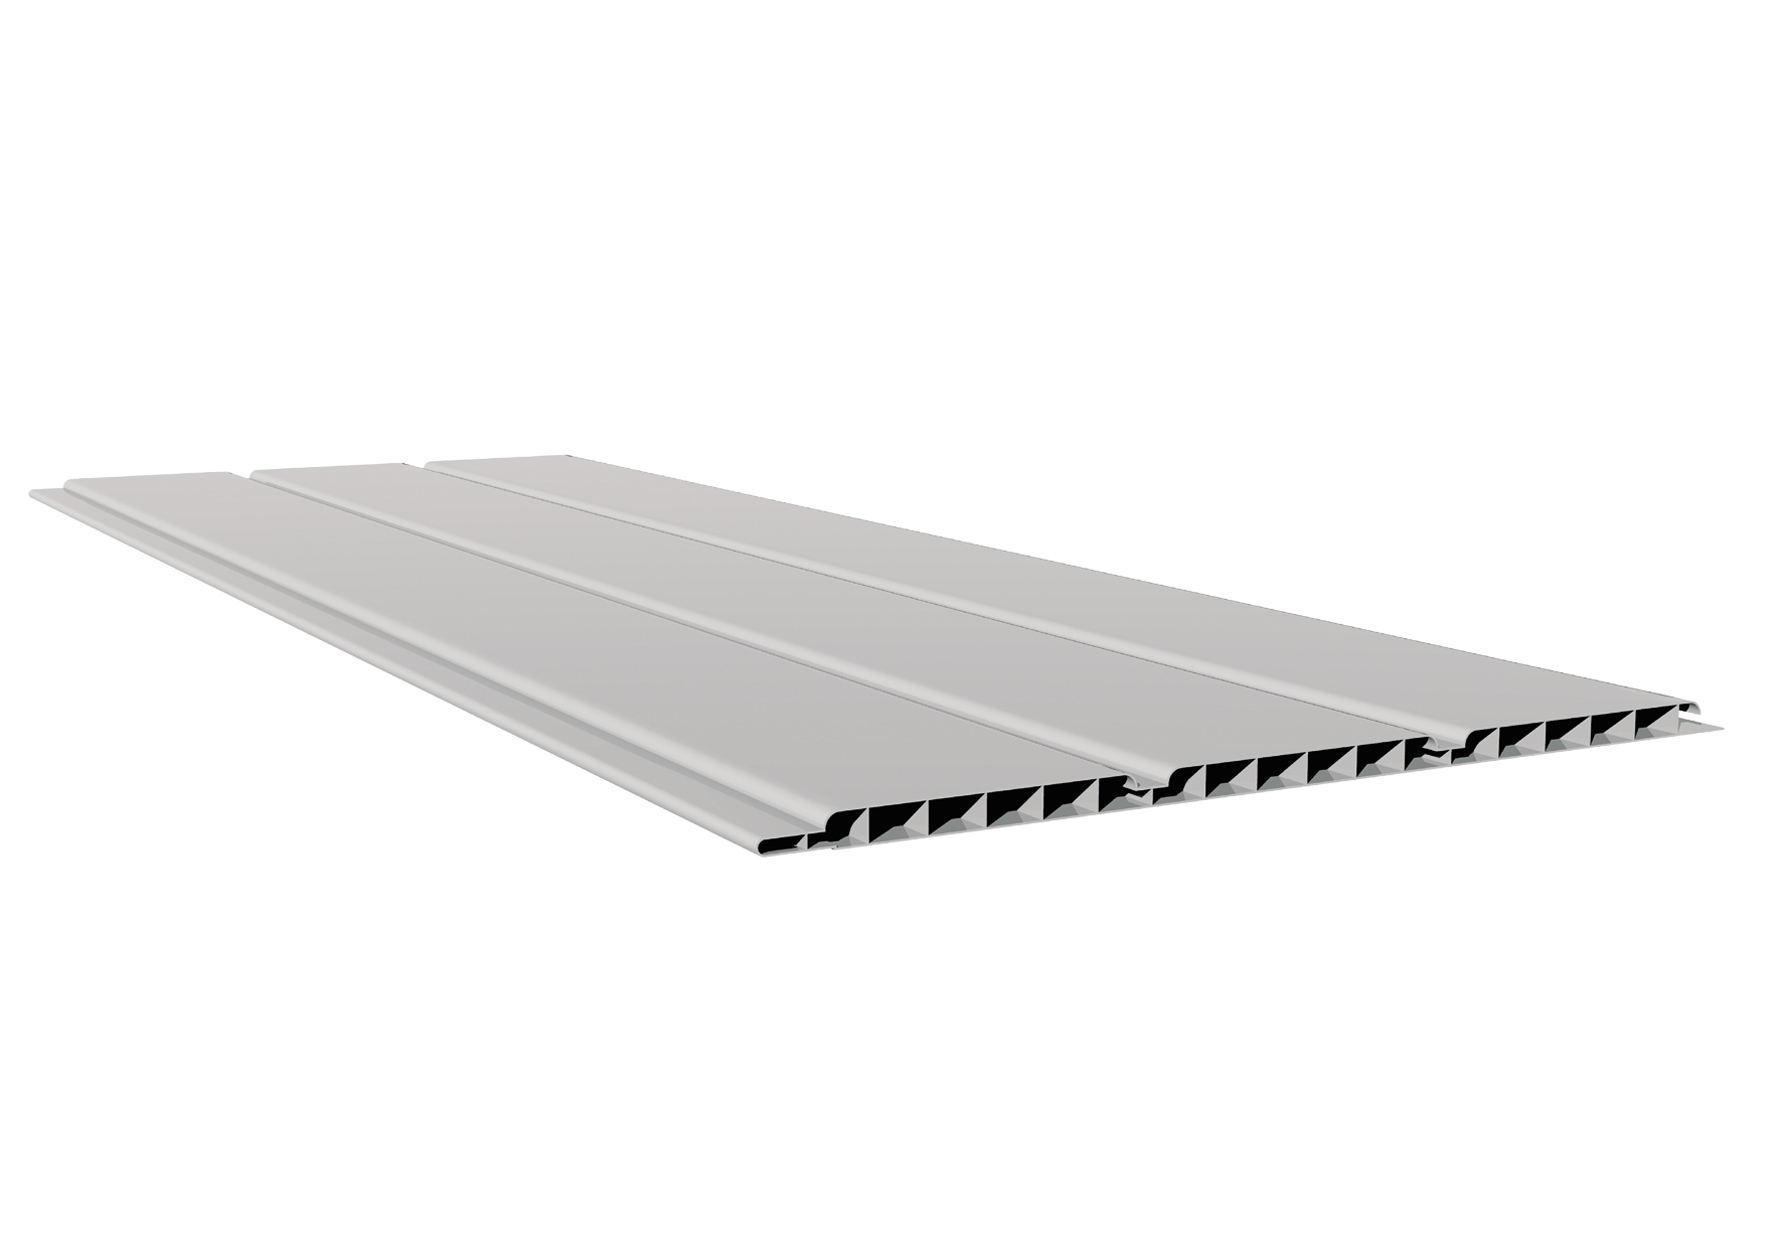 10mm Rigid Hollow Soffit Board Chelmsford Plastic Warehouse